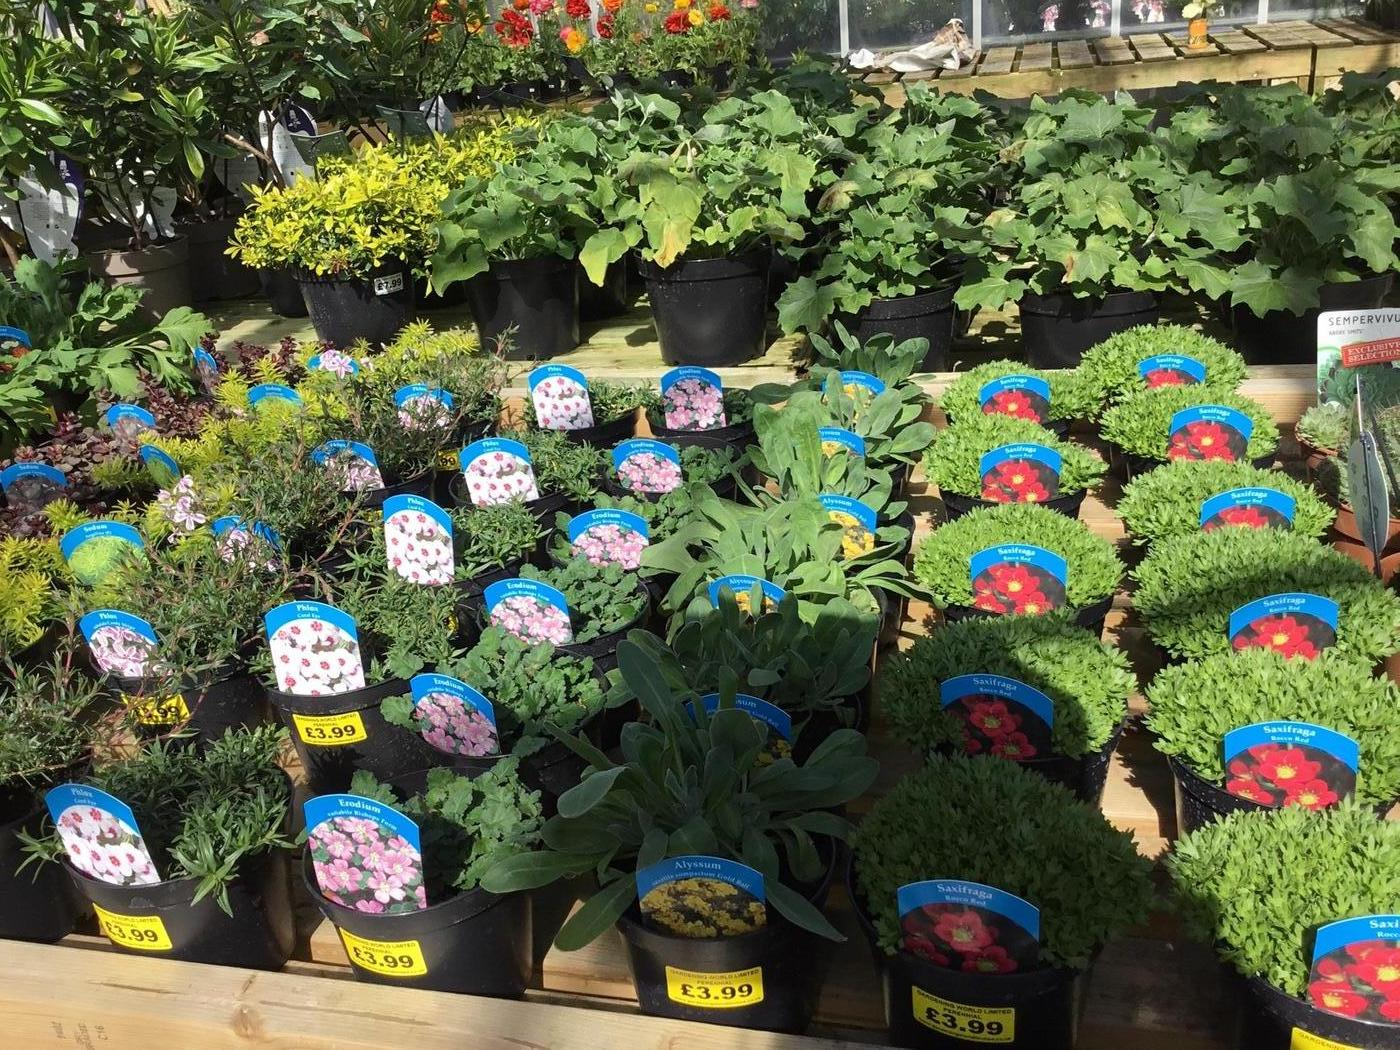 5 PERENNIAL ROCKERY PLANTS